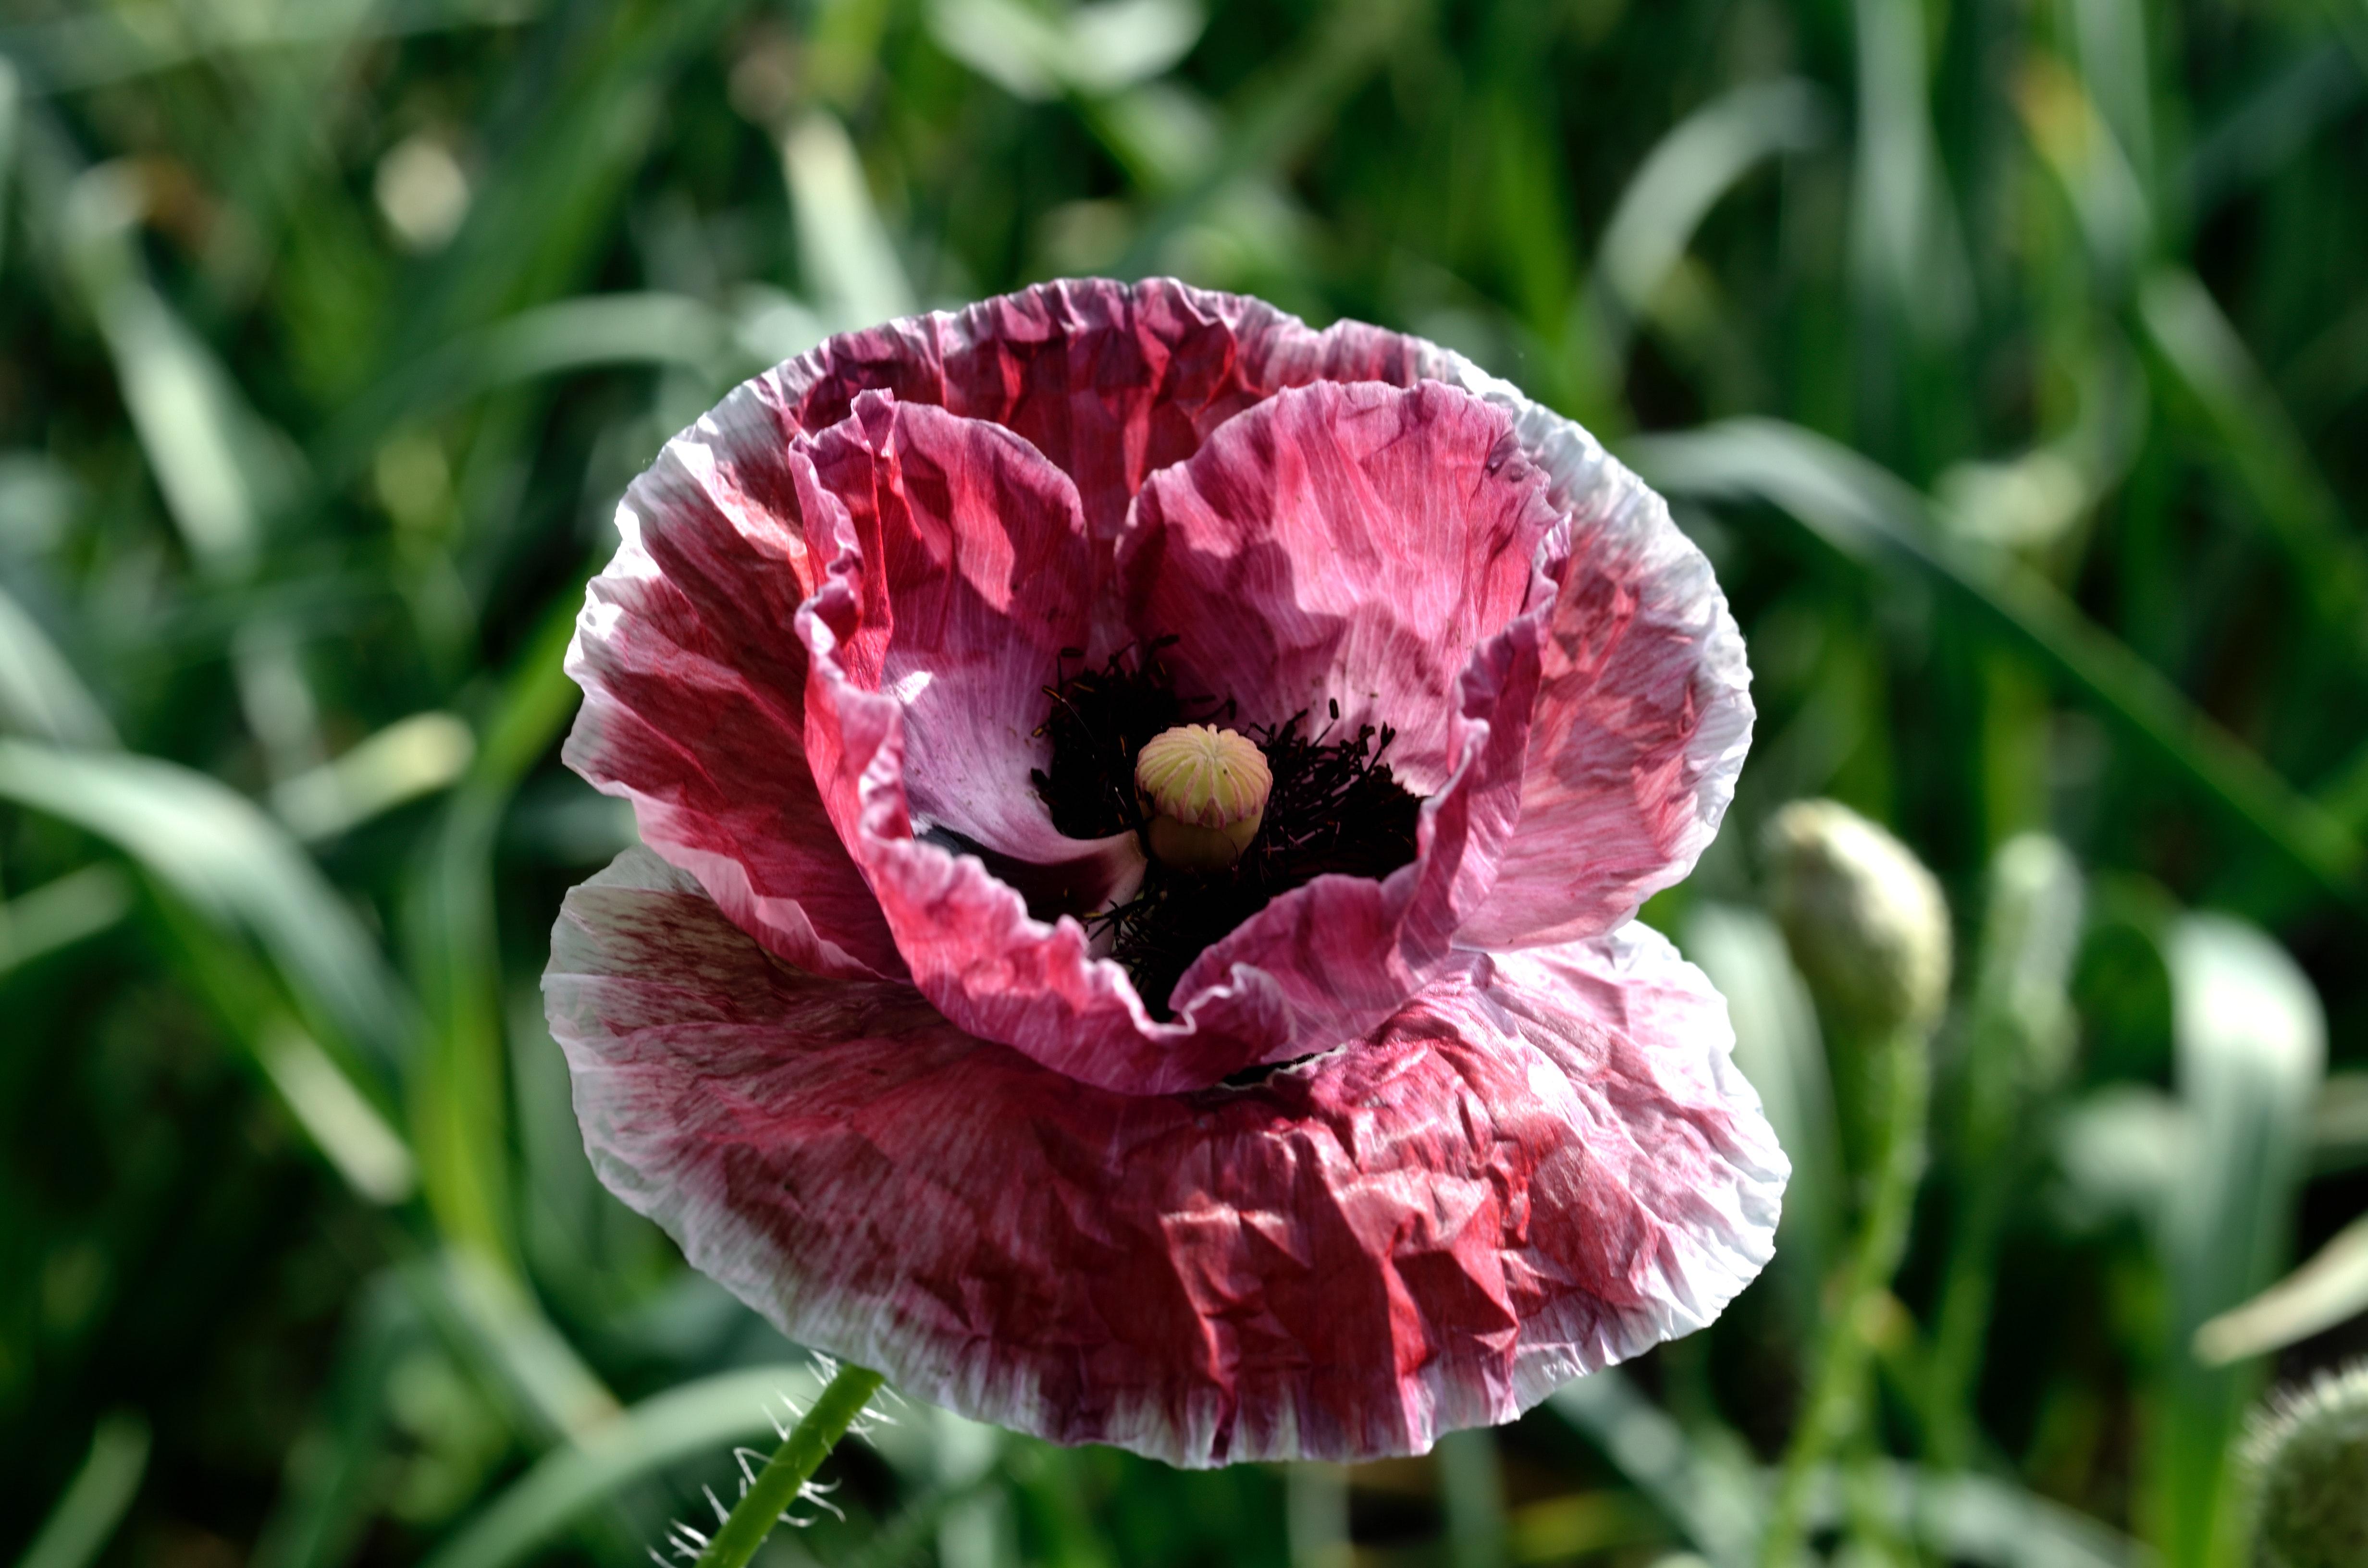 1000 interesting poppy flowers photos pexels free stock photos fetching more photos mightylinksfo